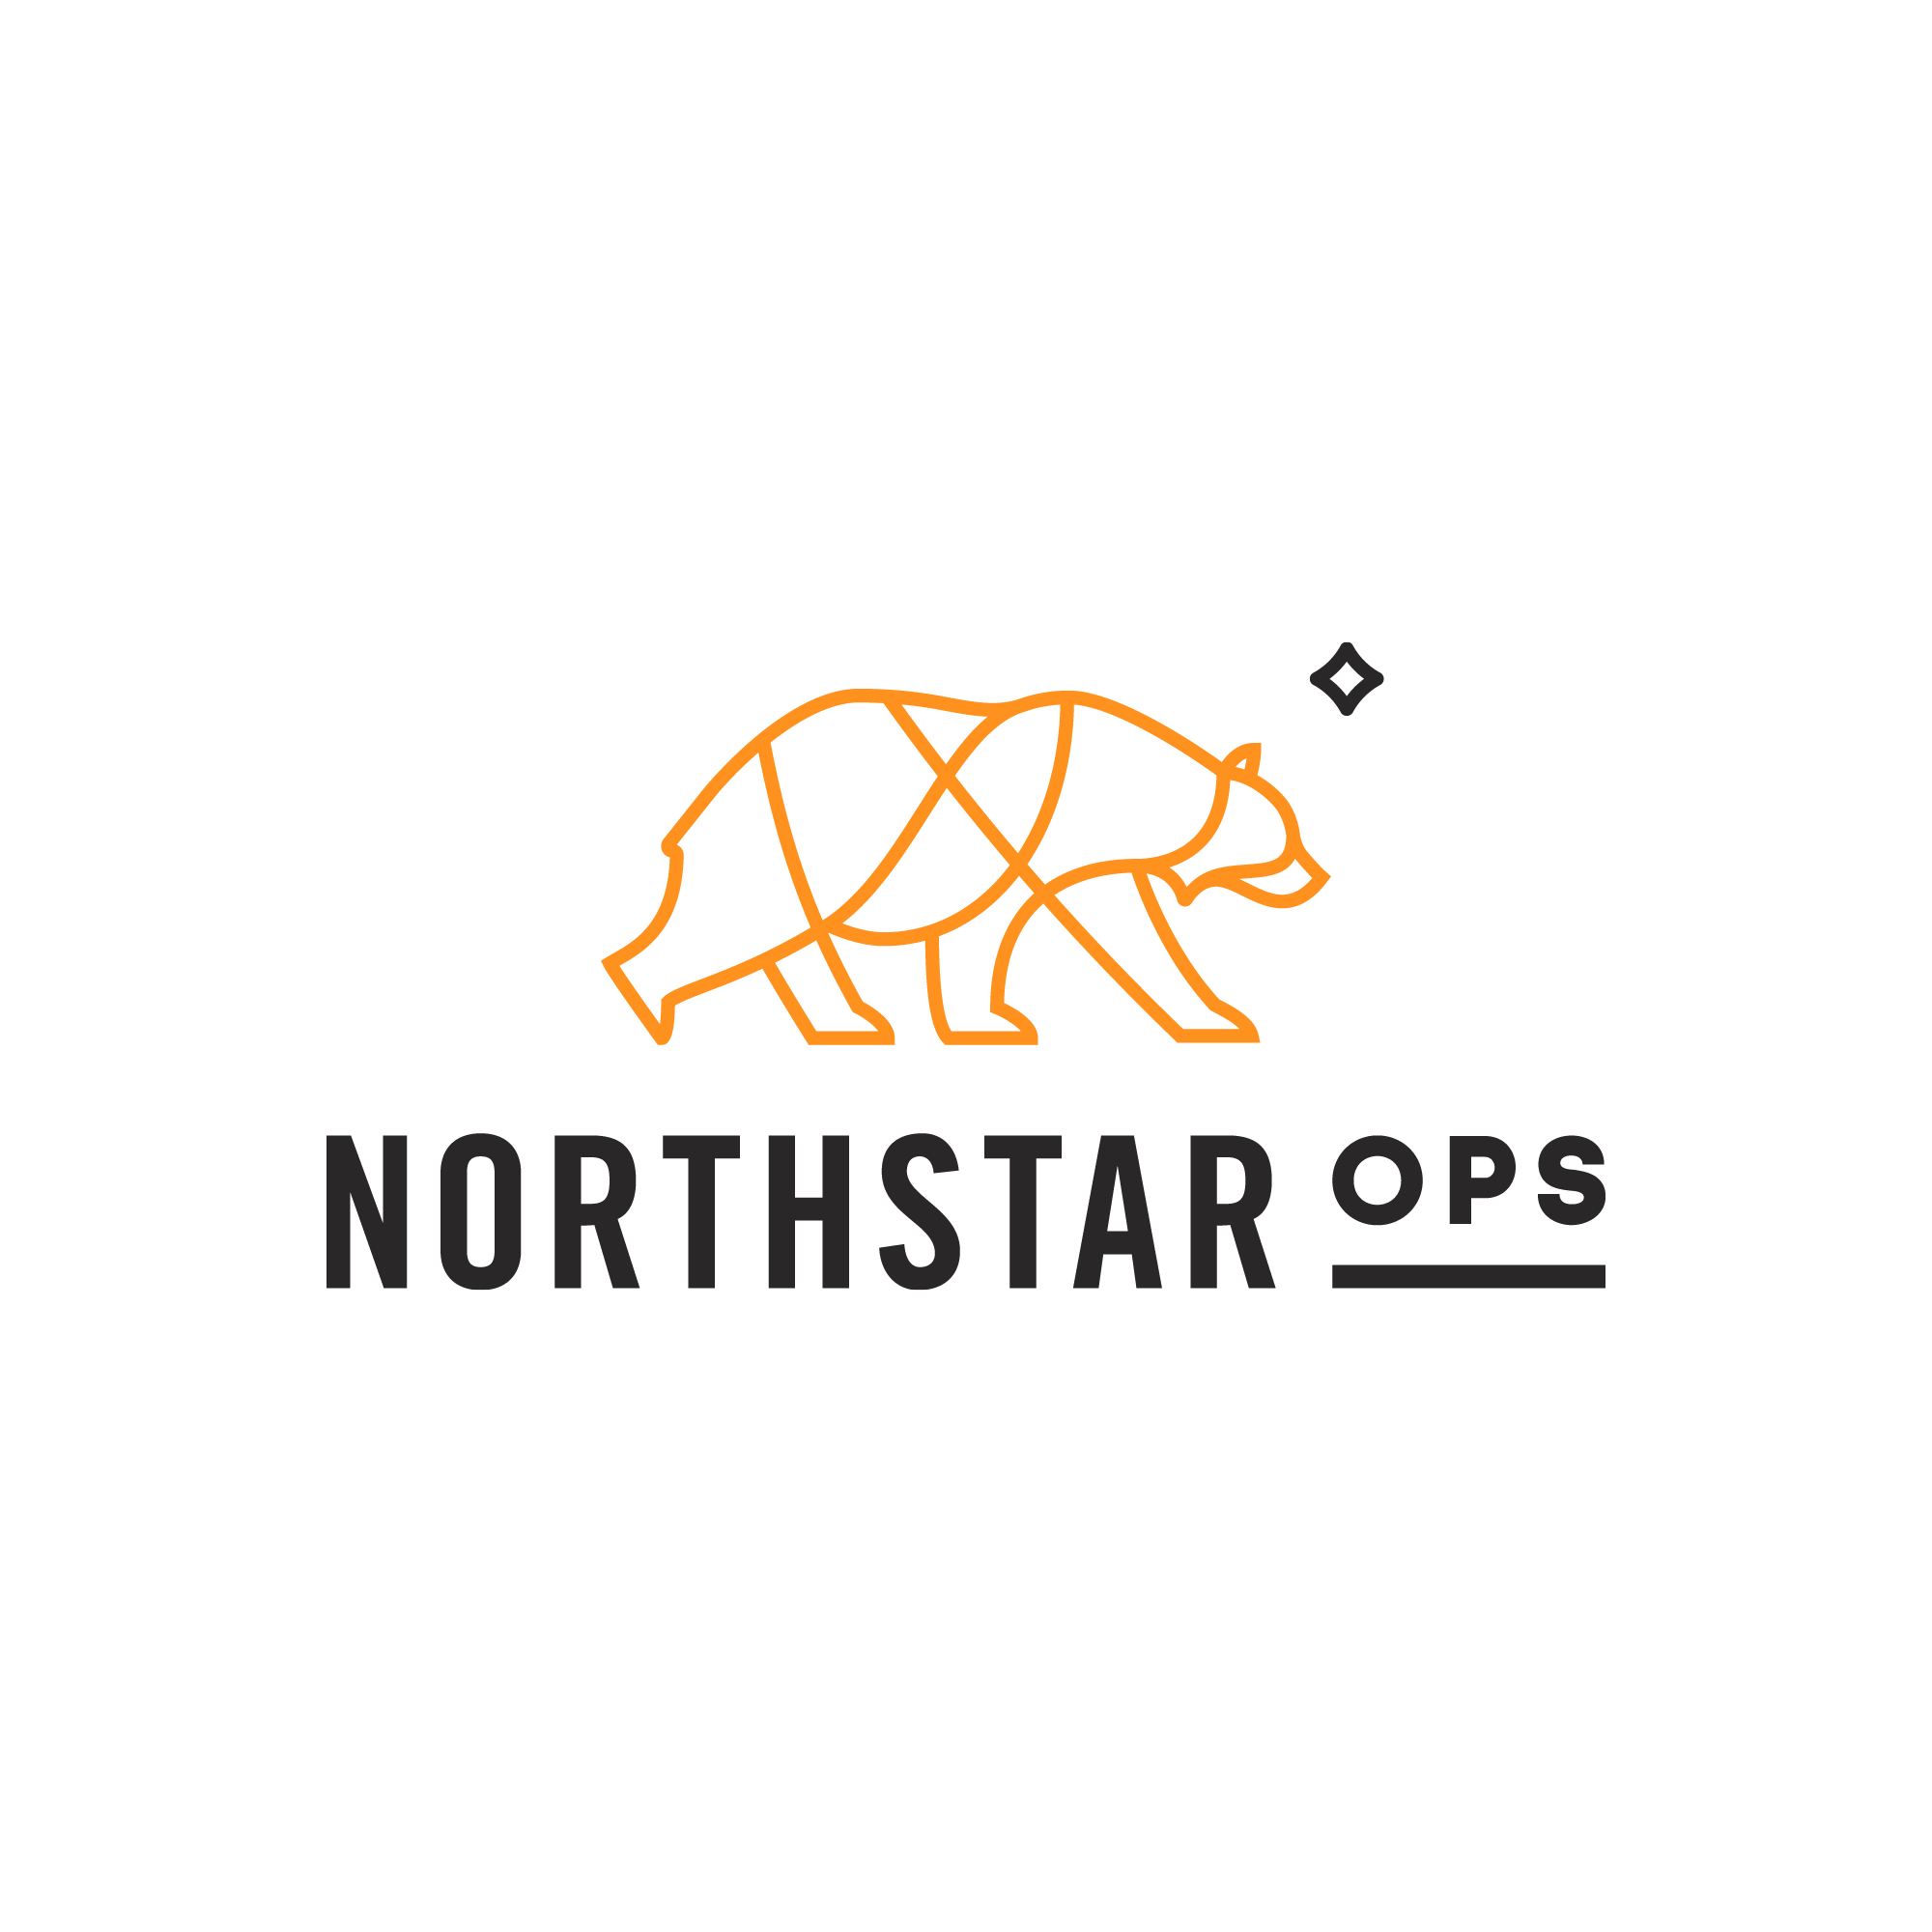 northstarops.png